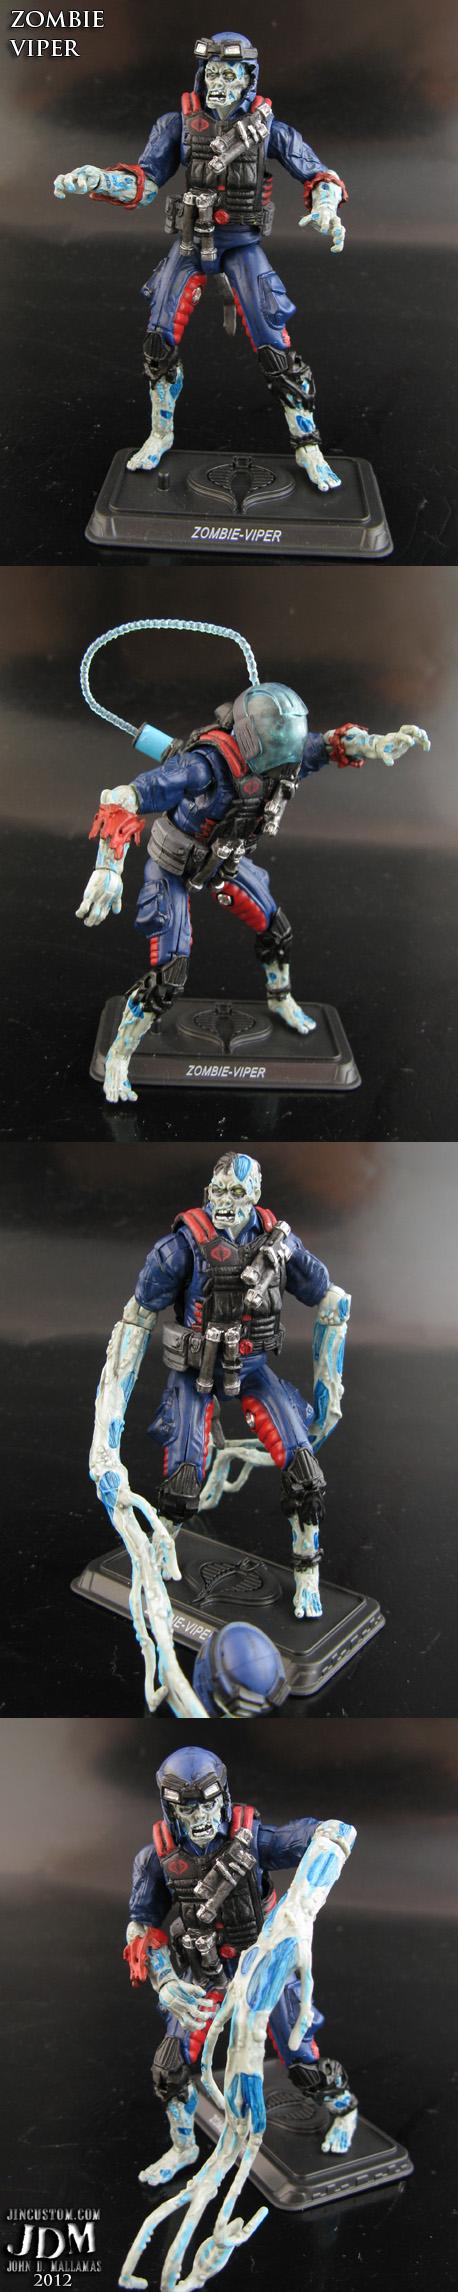 Cobra Zombie Viper Trooper by Jin-Saotome